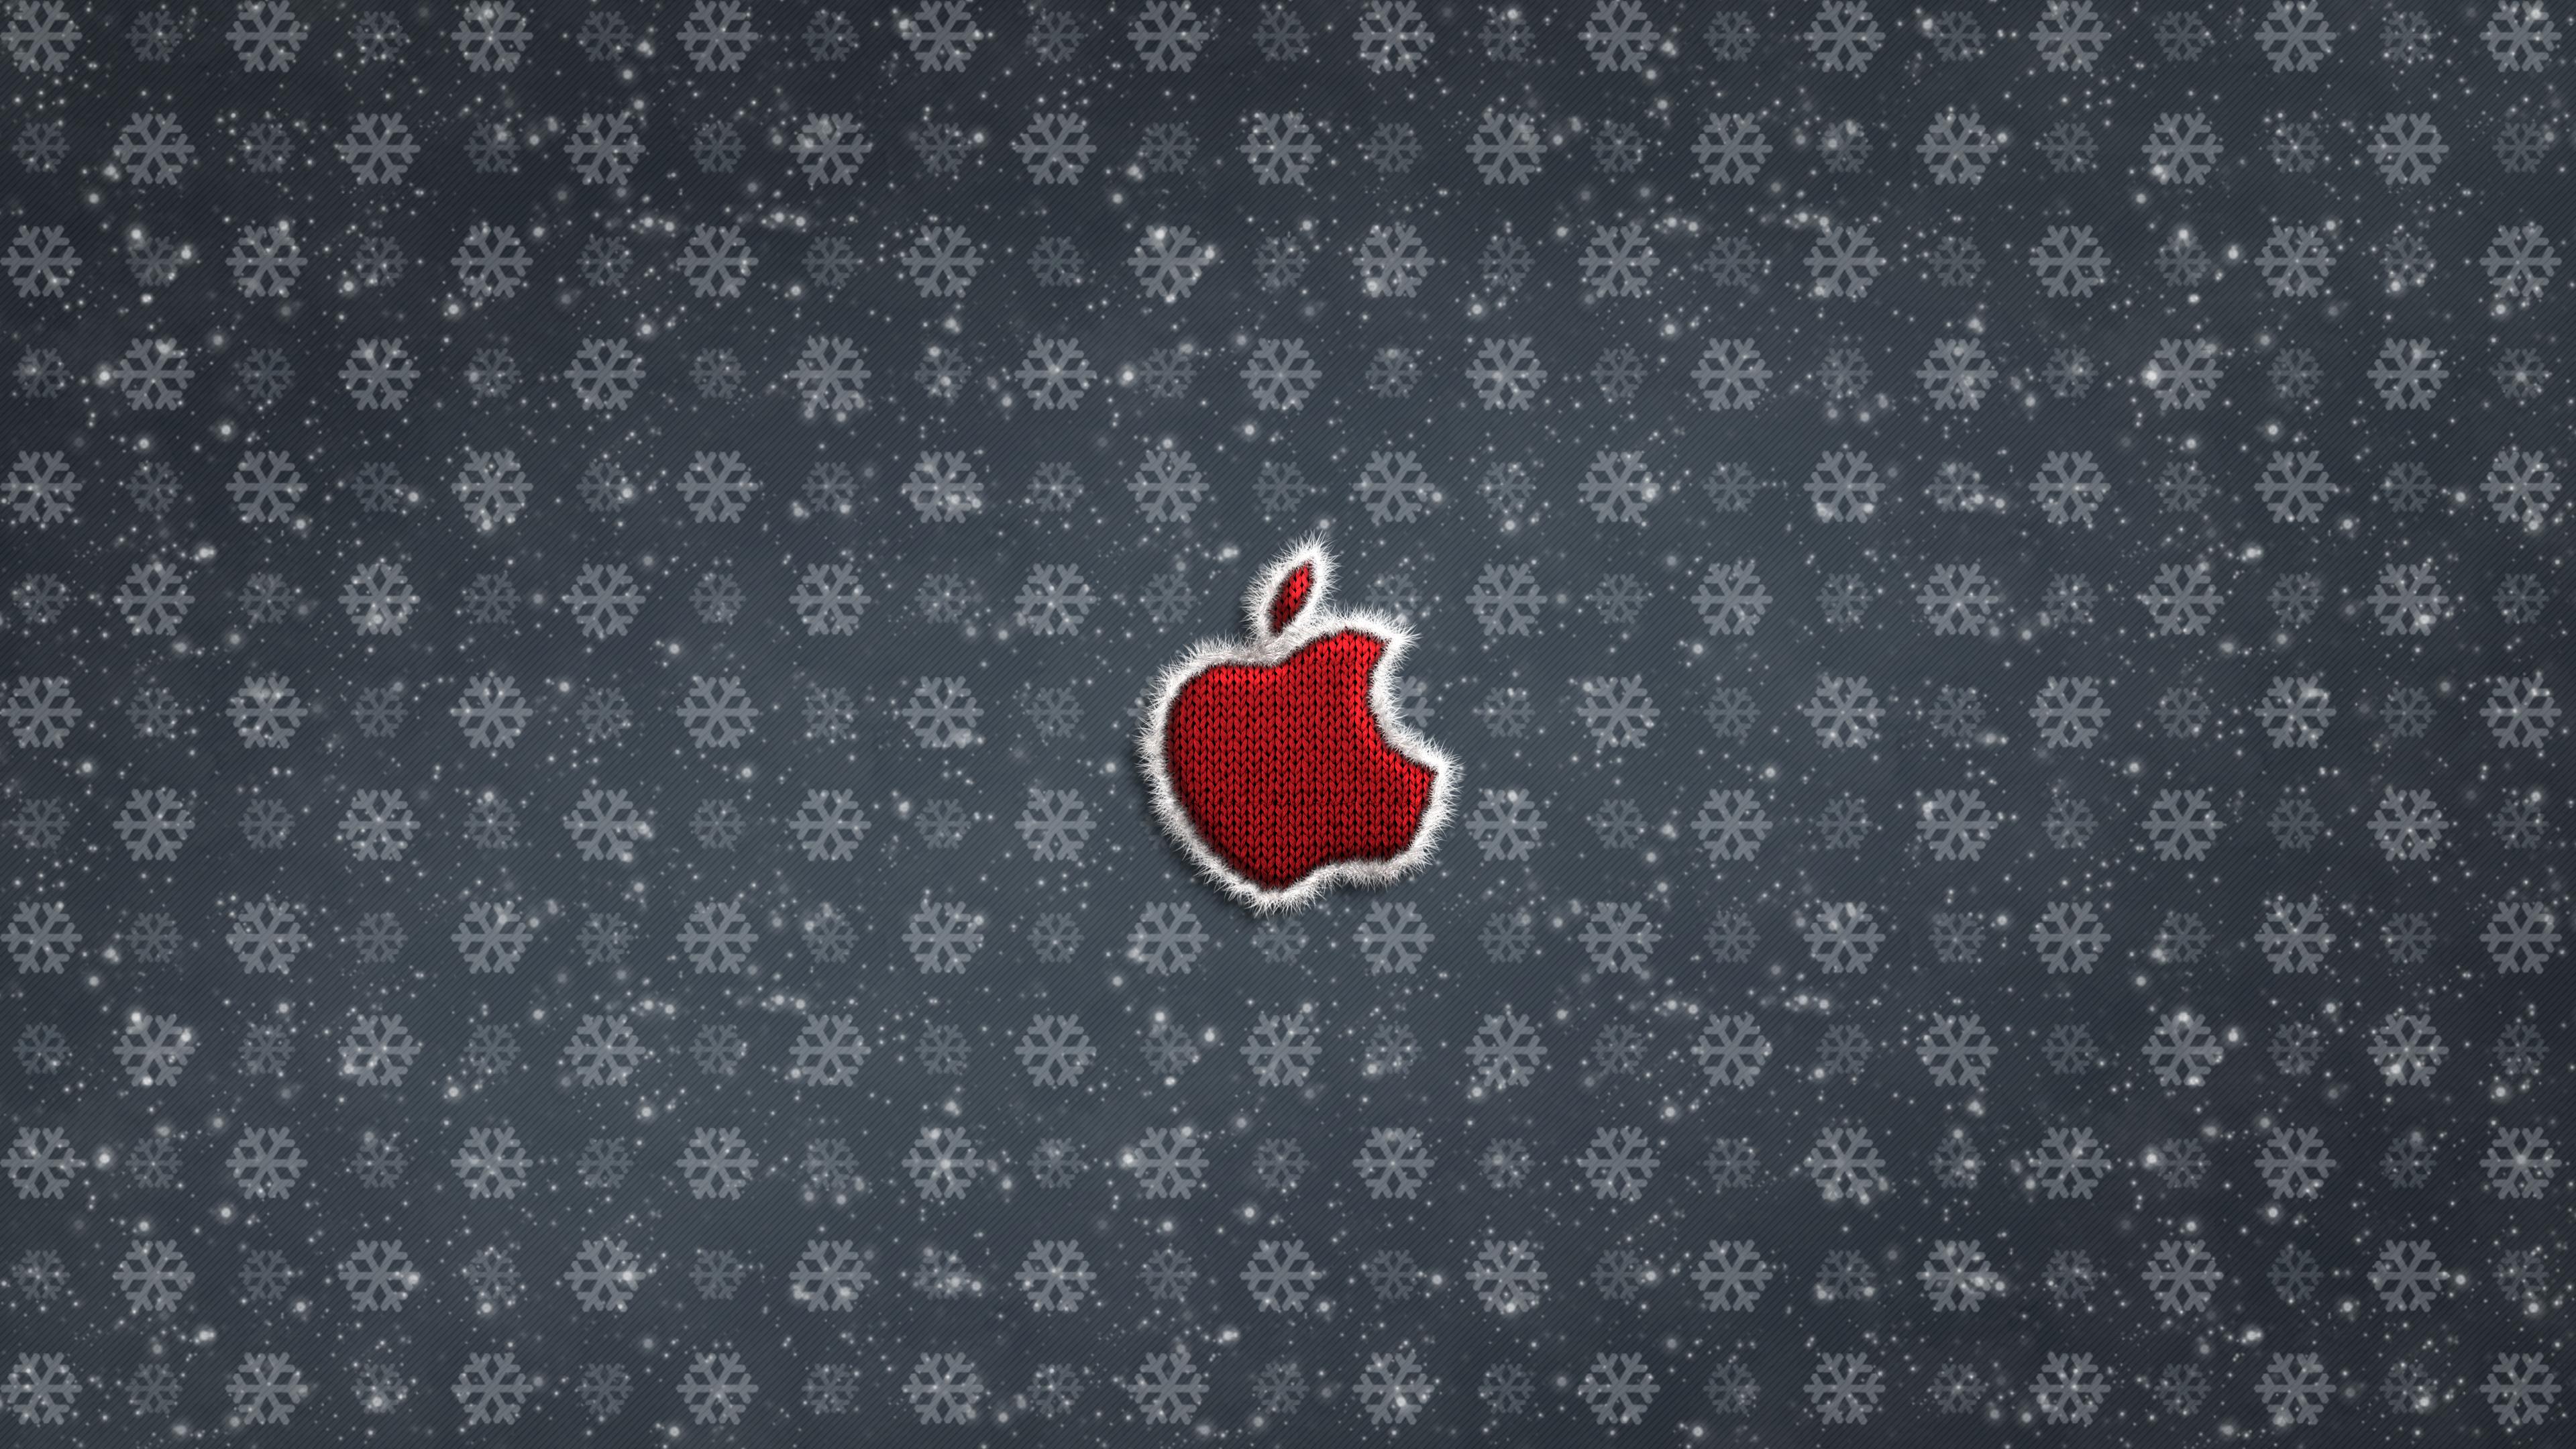 Apple Logo Iphone Wallpaper Hd 4k Download